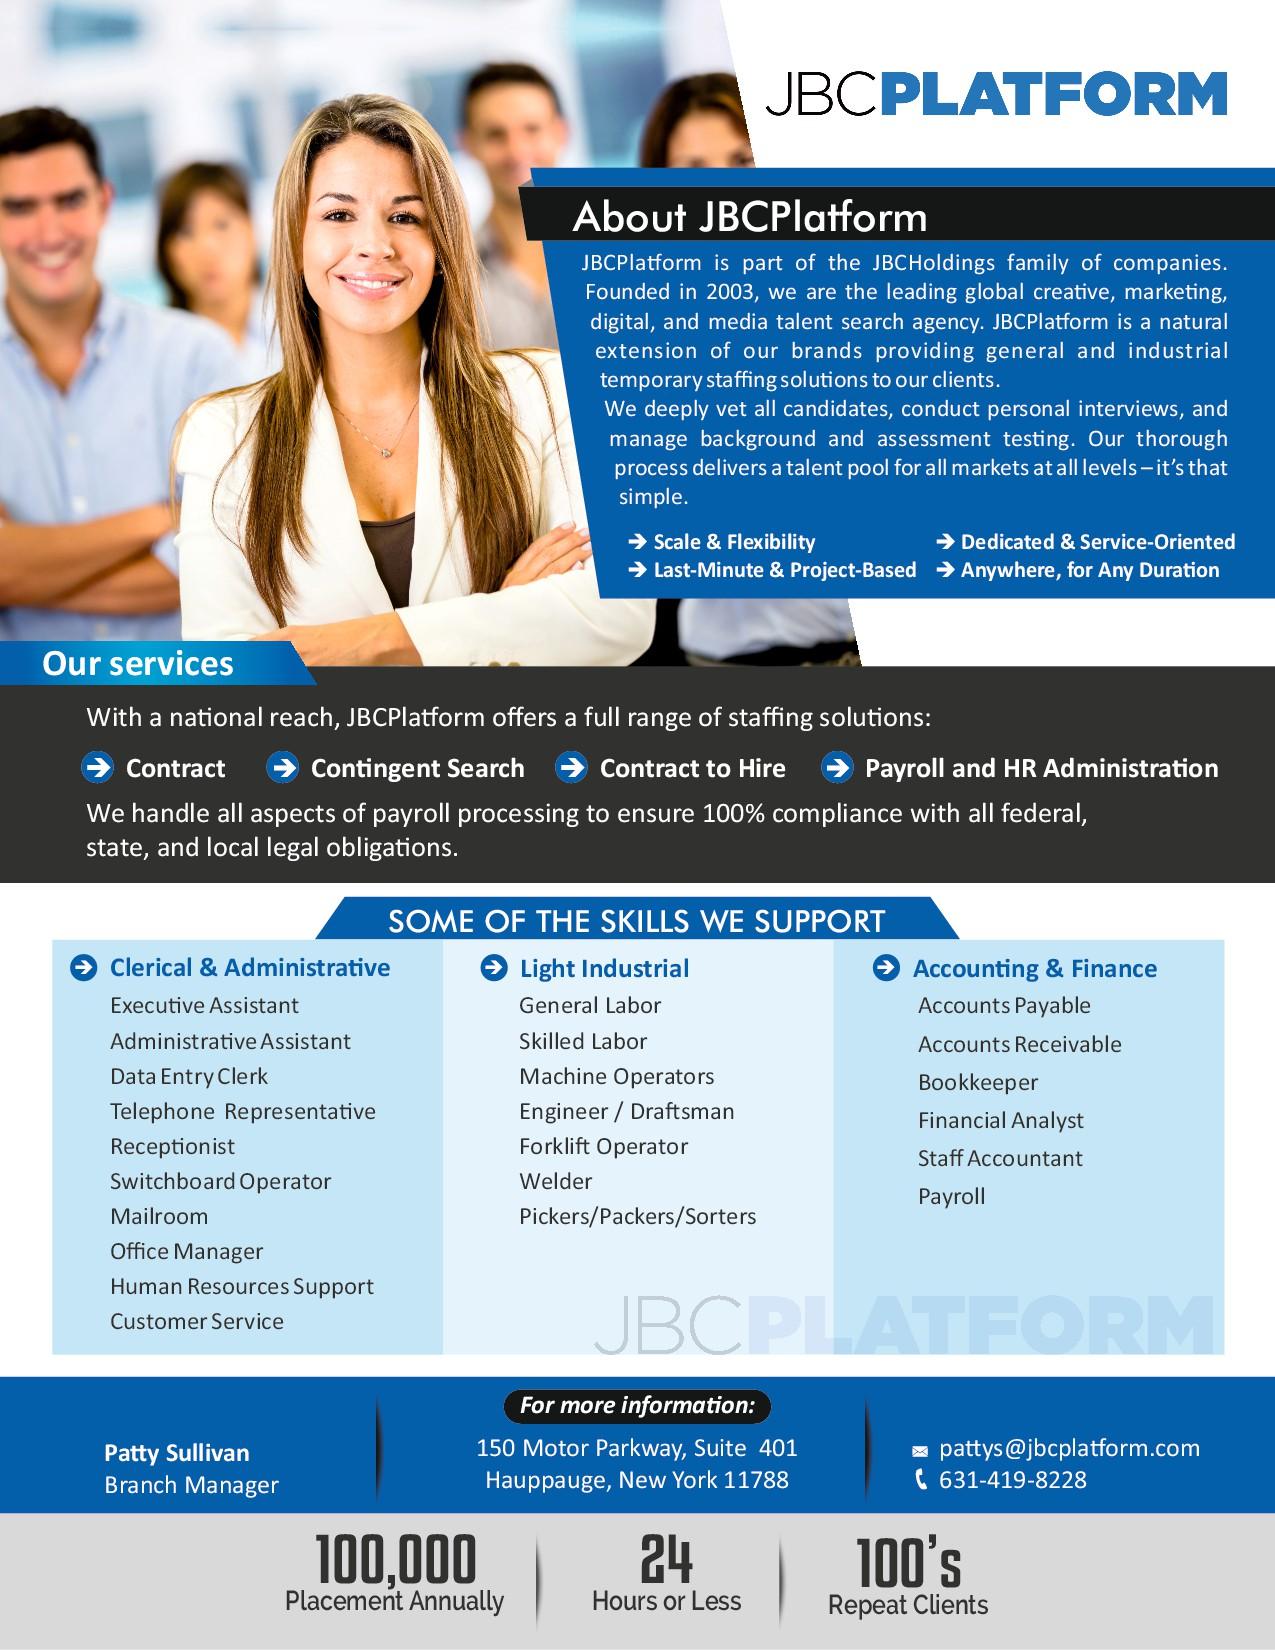 Create a one page marketing flyer for JBCPlatform